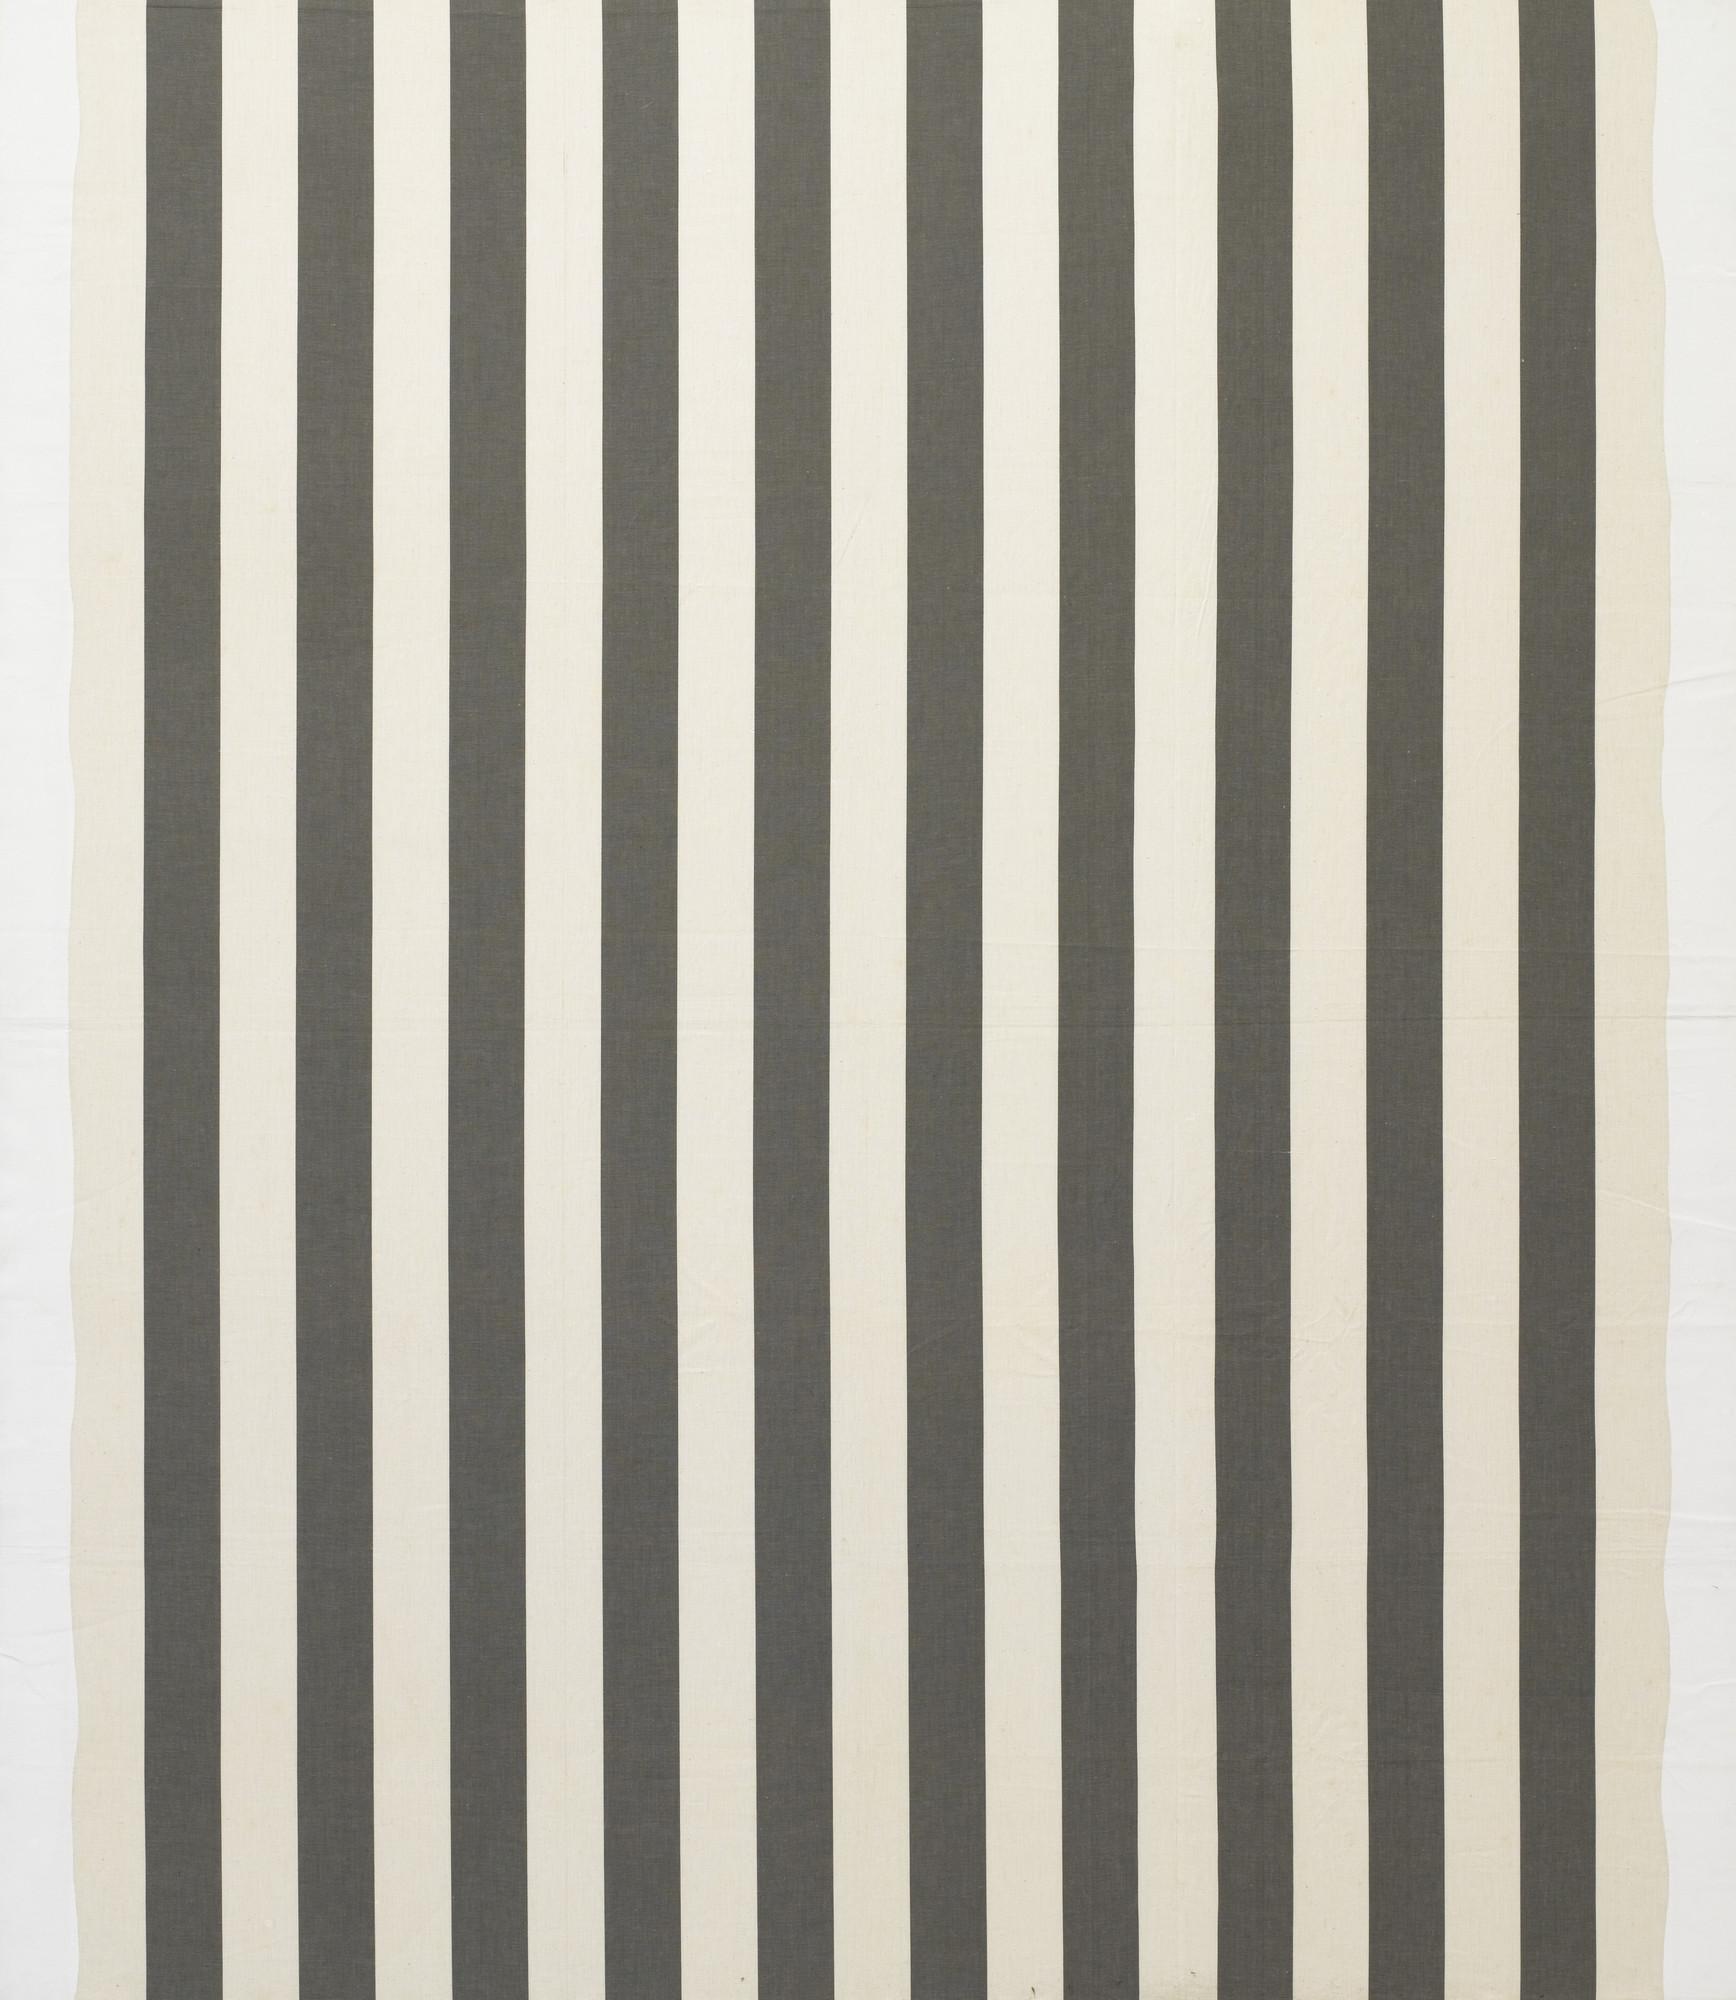 Daniel Buren White Acrylic Painting On White And Anthracite Gray